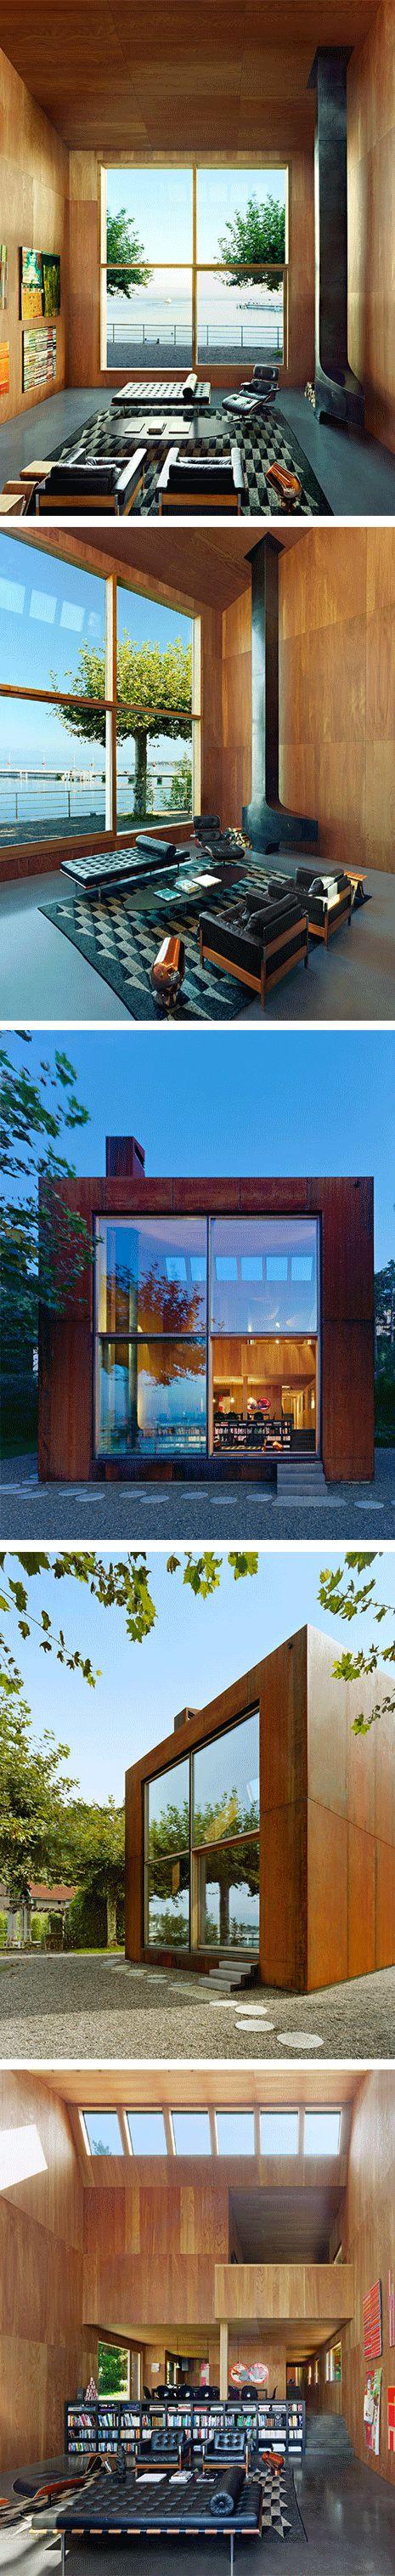 Casa 26 - Hétérofocus - Thonon-les-bains - France  #ChemineeFocus #Focus #cheminee #design #architecture